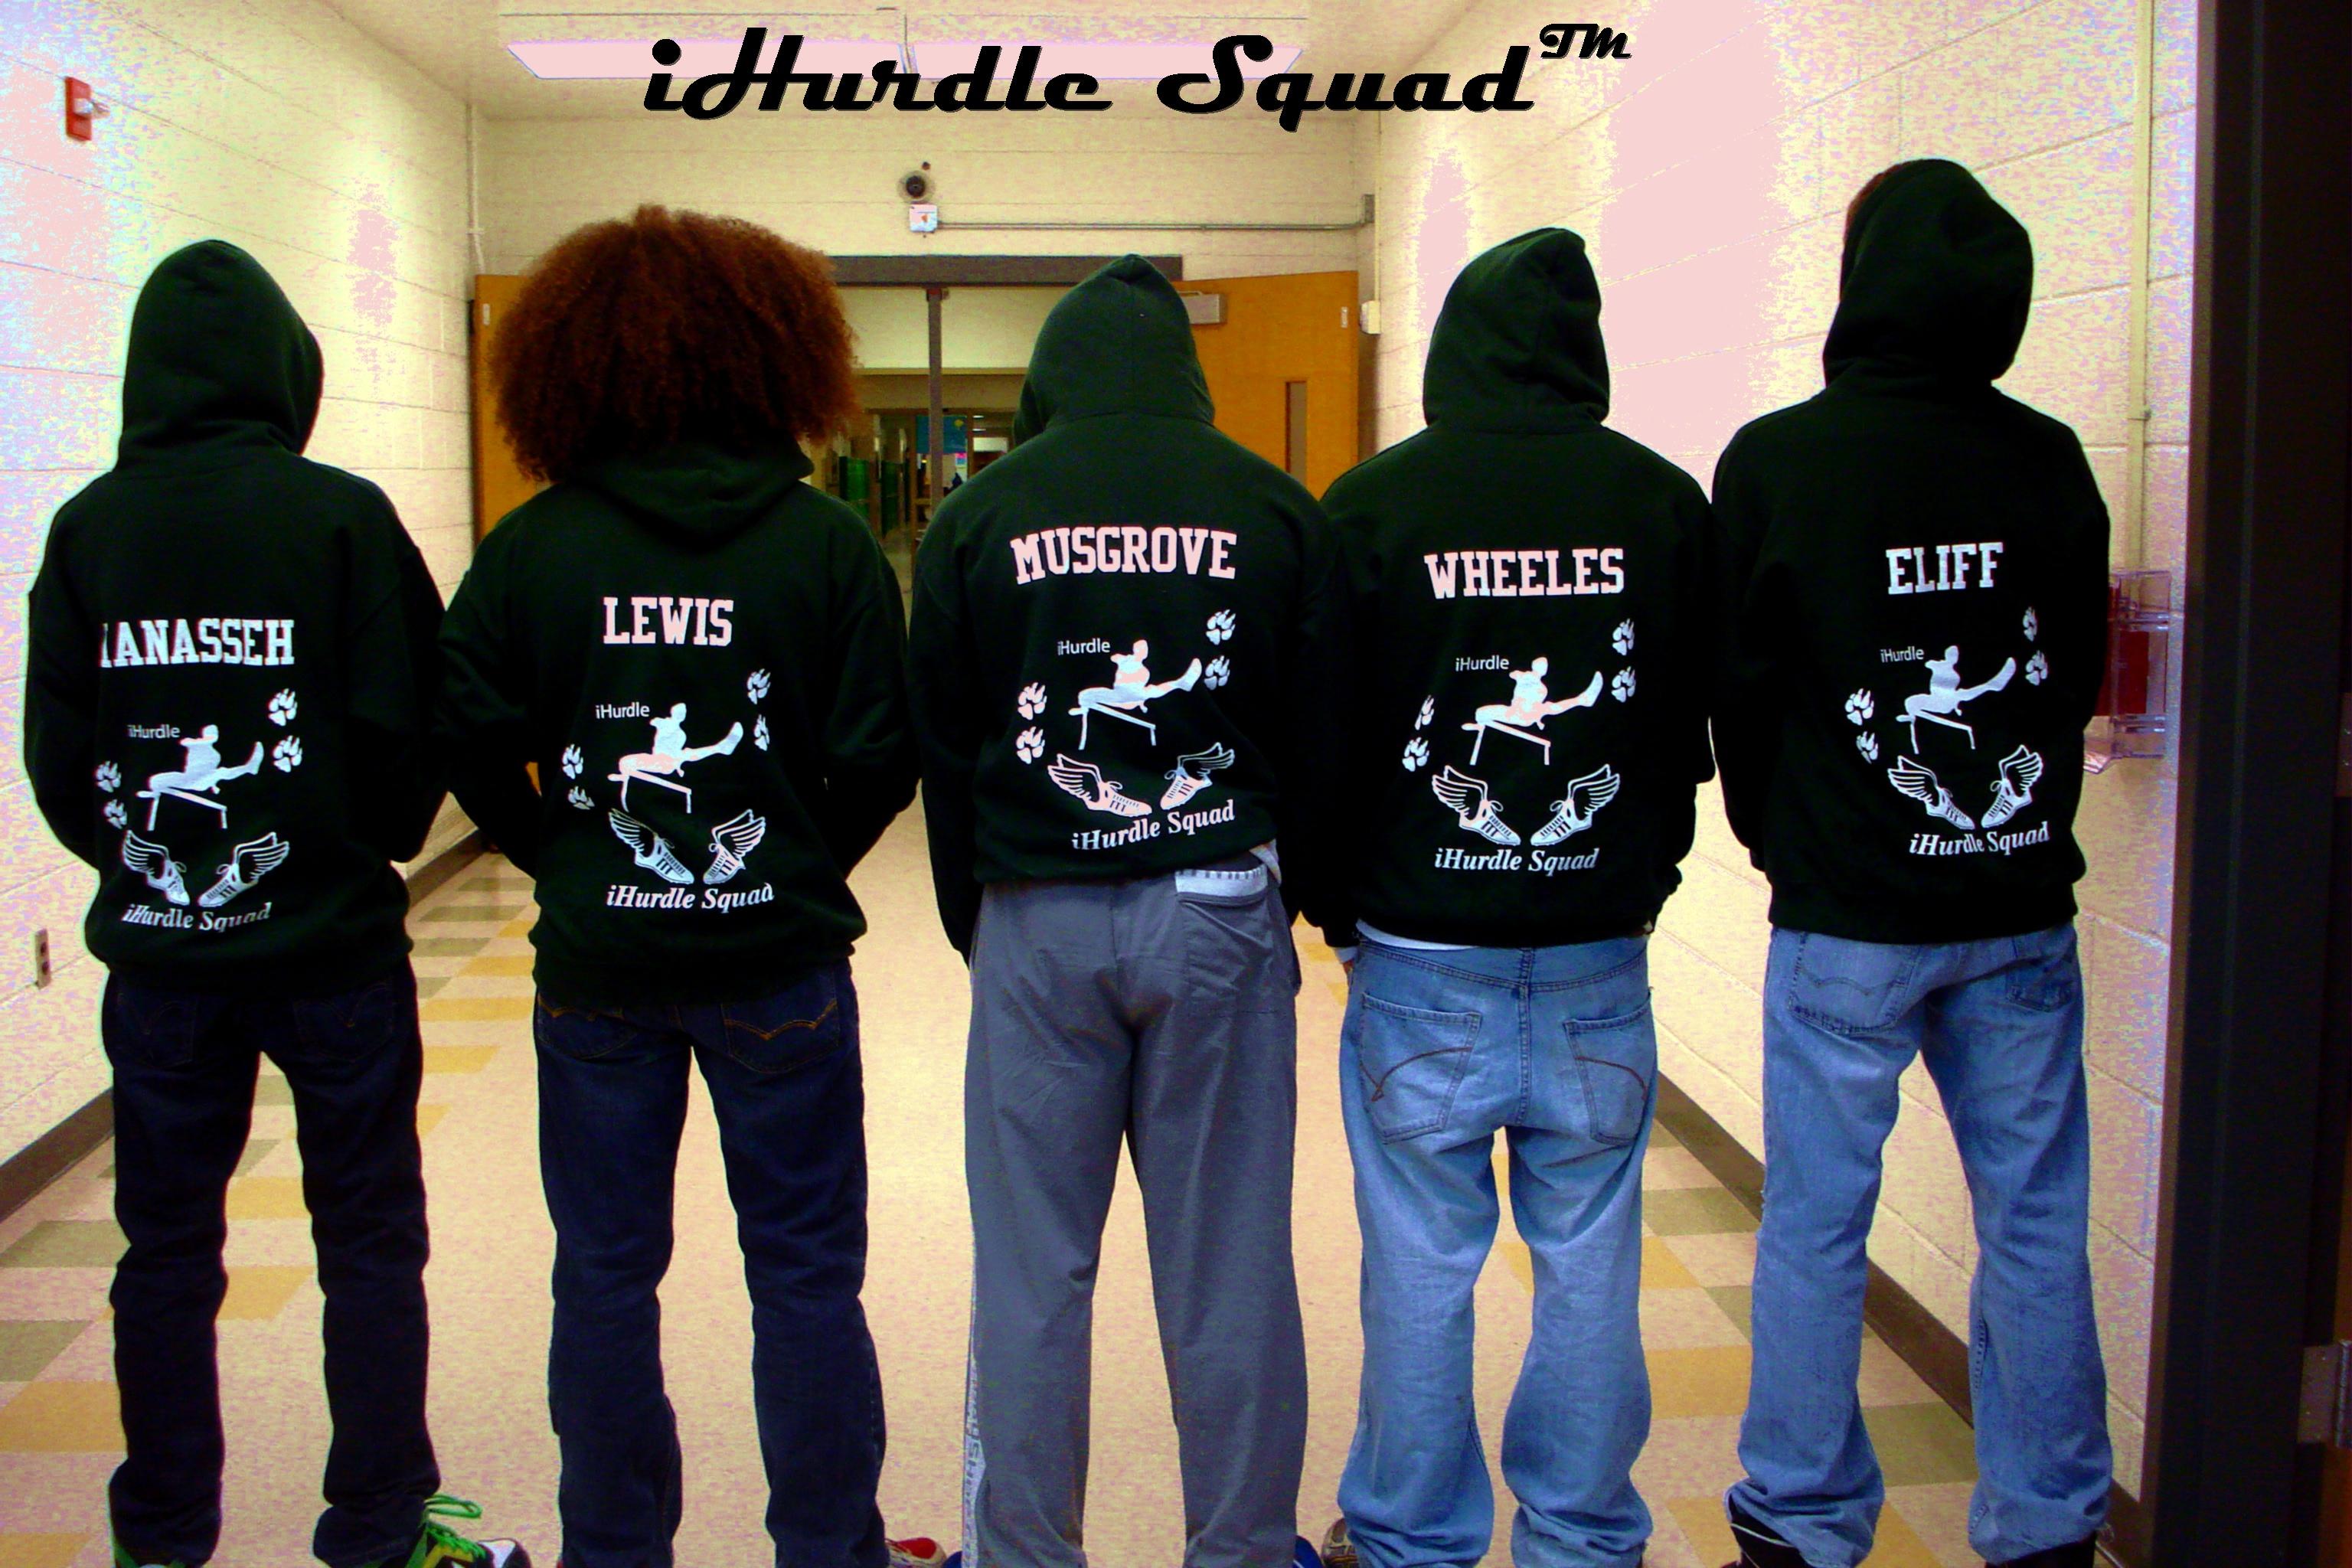 Custom T Shirts For Hurdle Squad Shirt Design Ideas